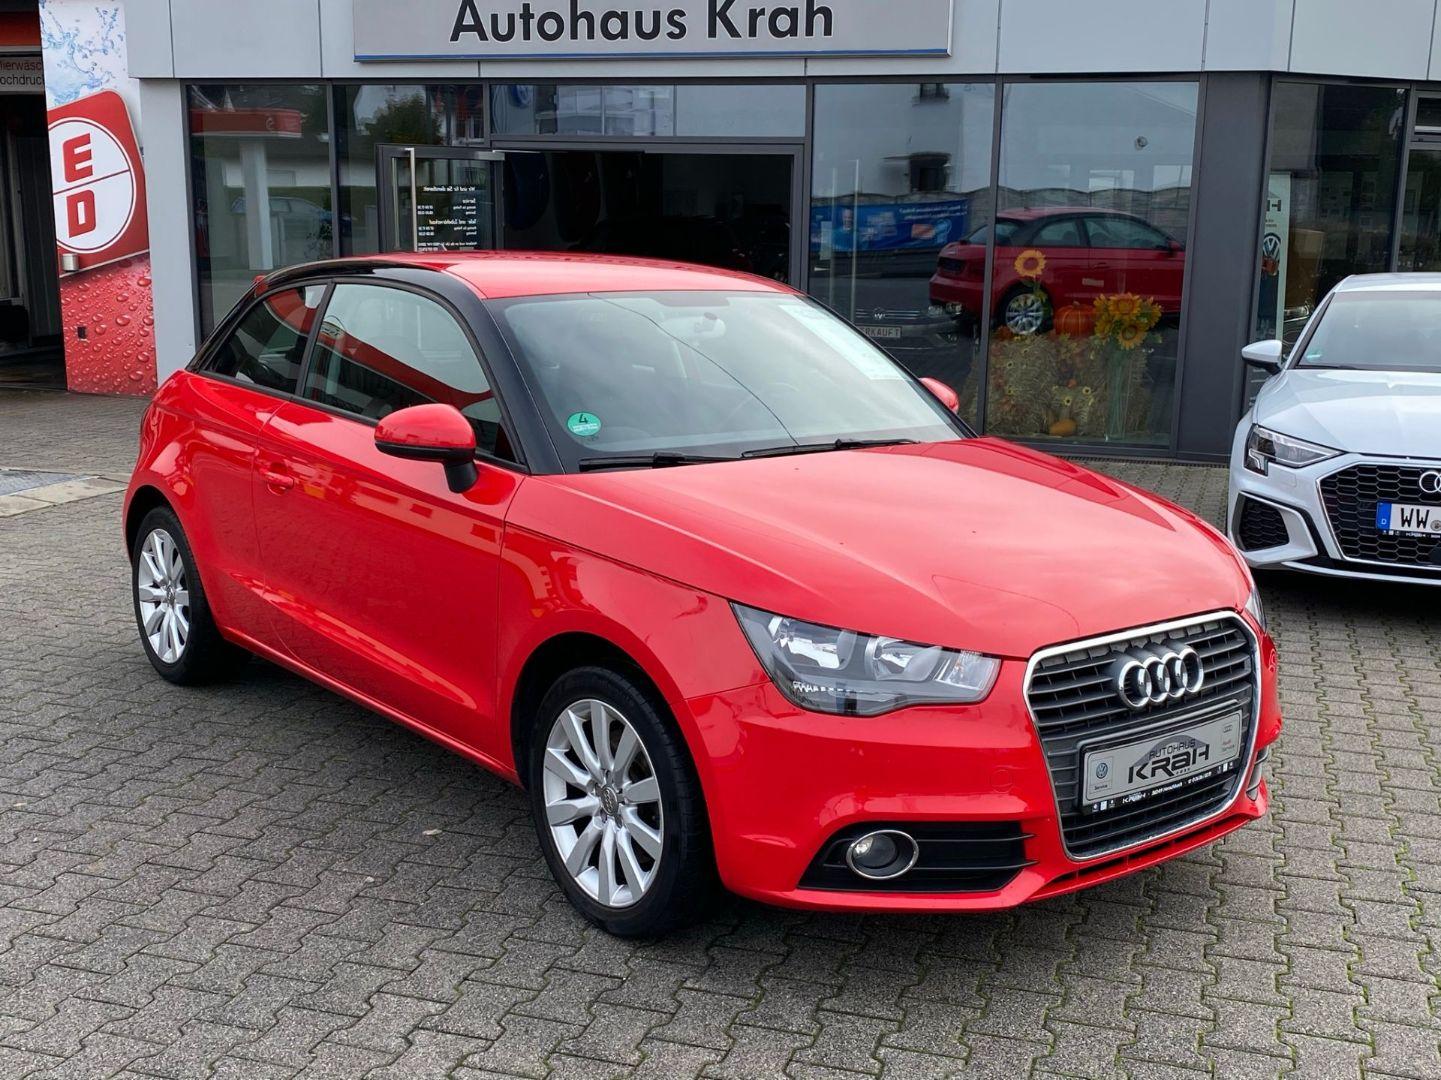 Audi A1 Ambition 1.4 TFSI, Lim 1.4 TSI, Jahr 2014, Benzin